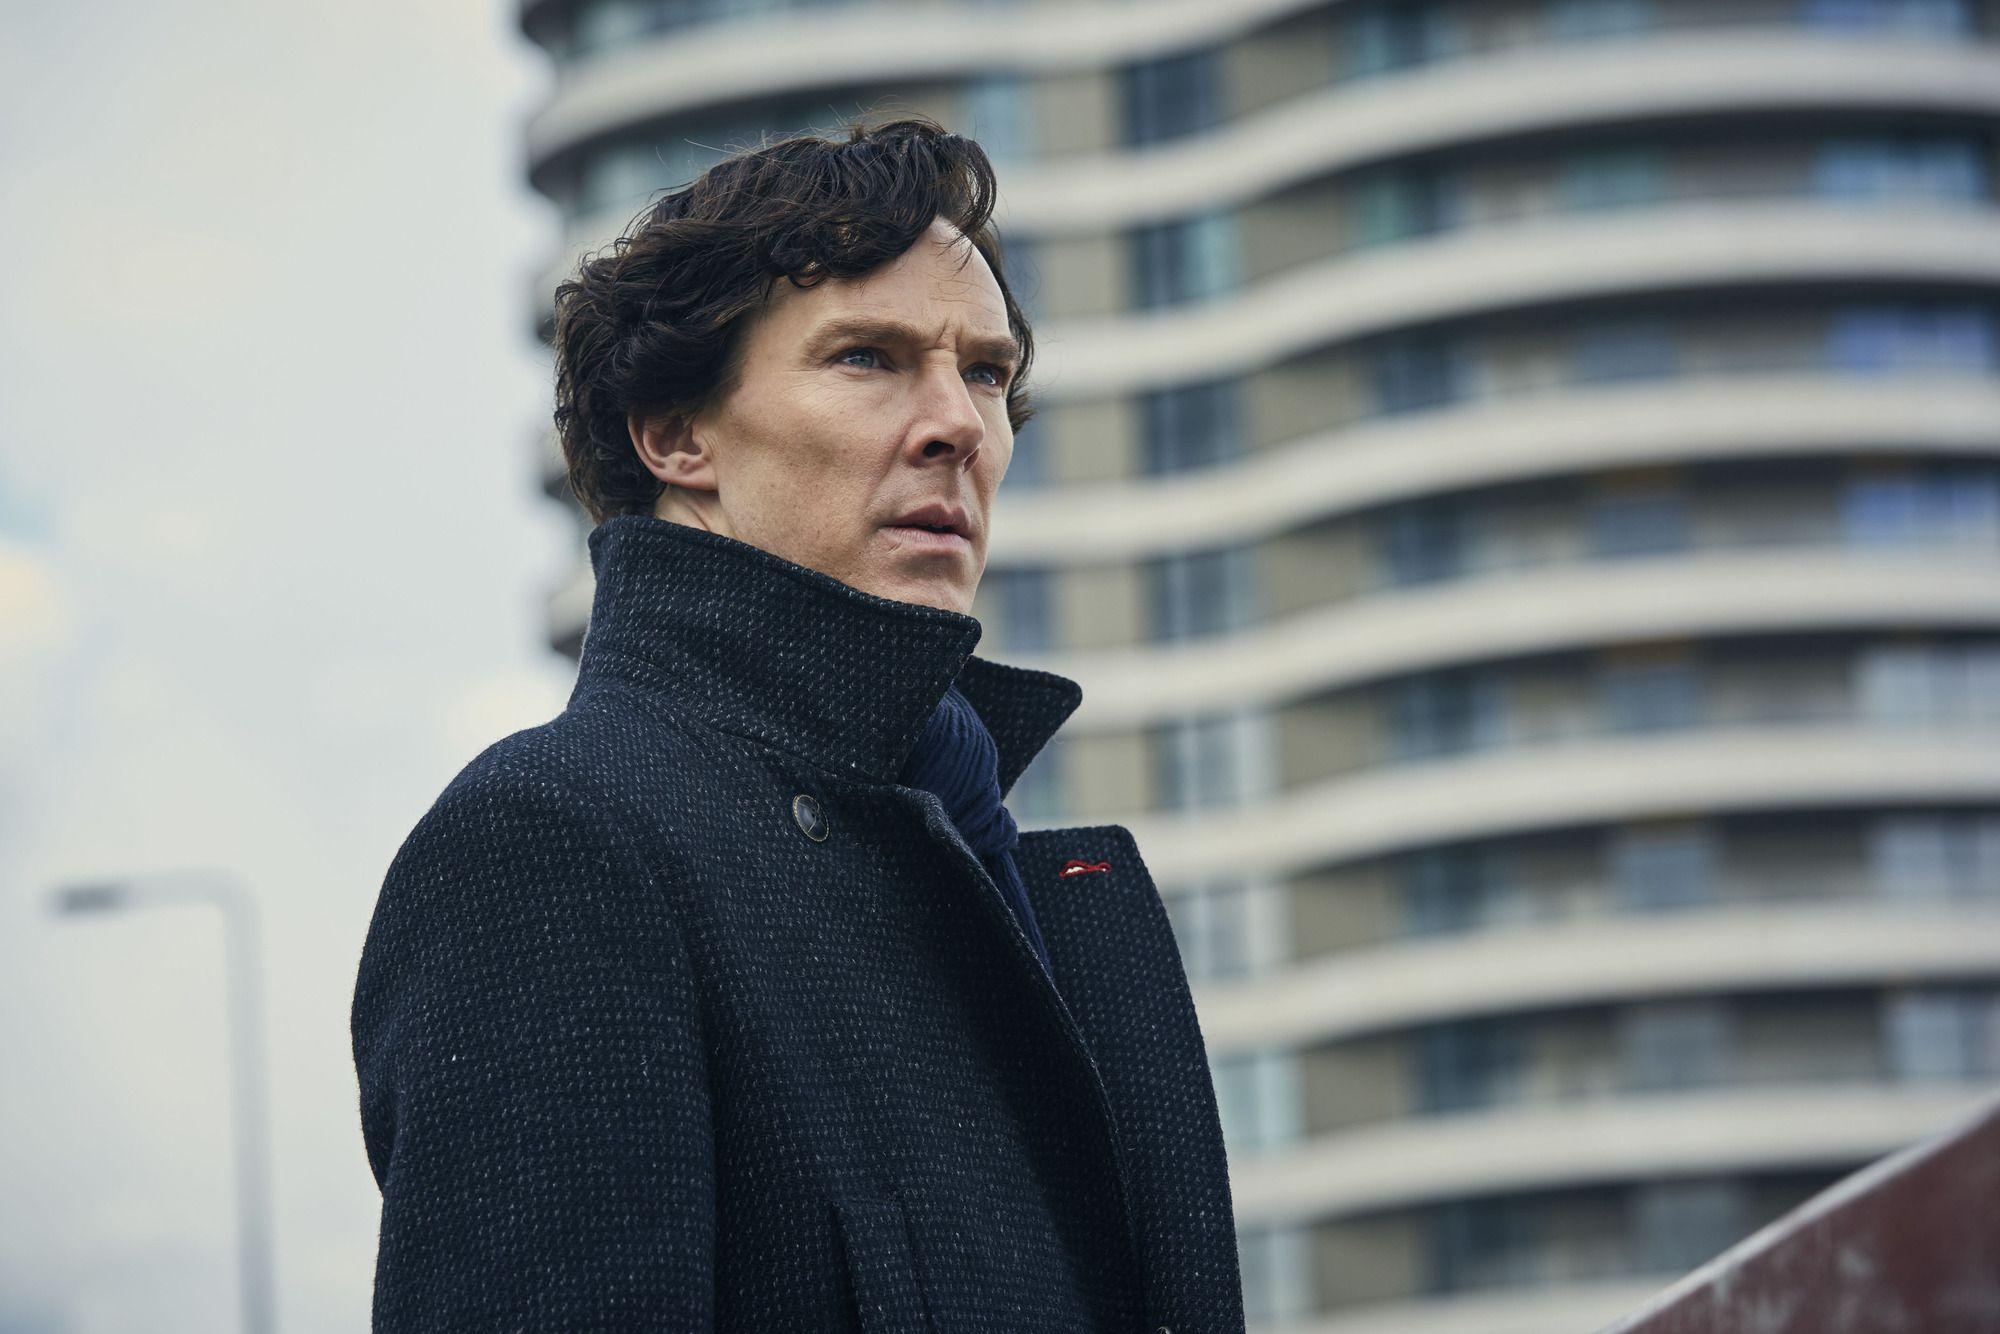 Sherlock creator explains how Benedict Cumberbatch inspired BBC's Dracula